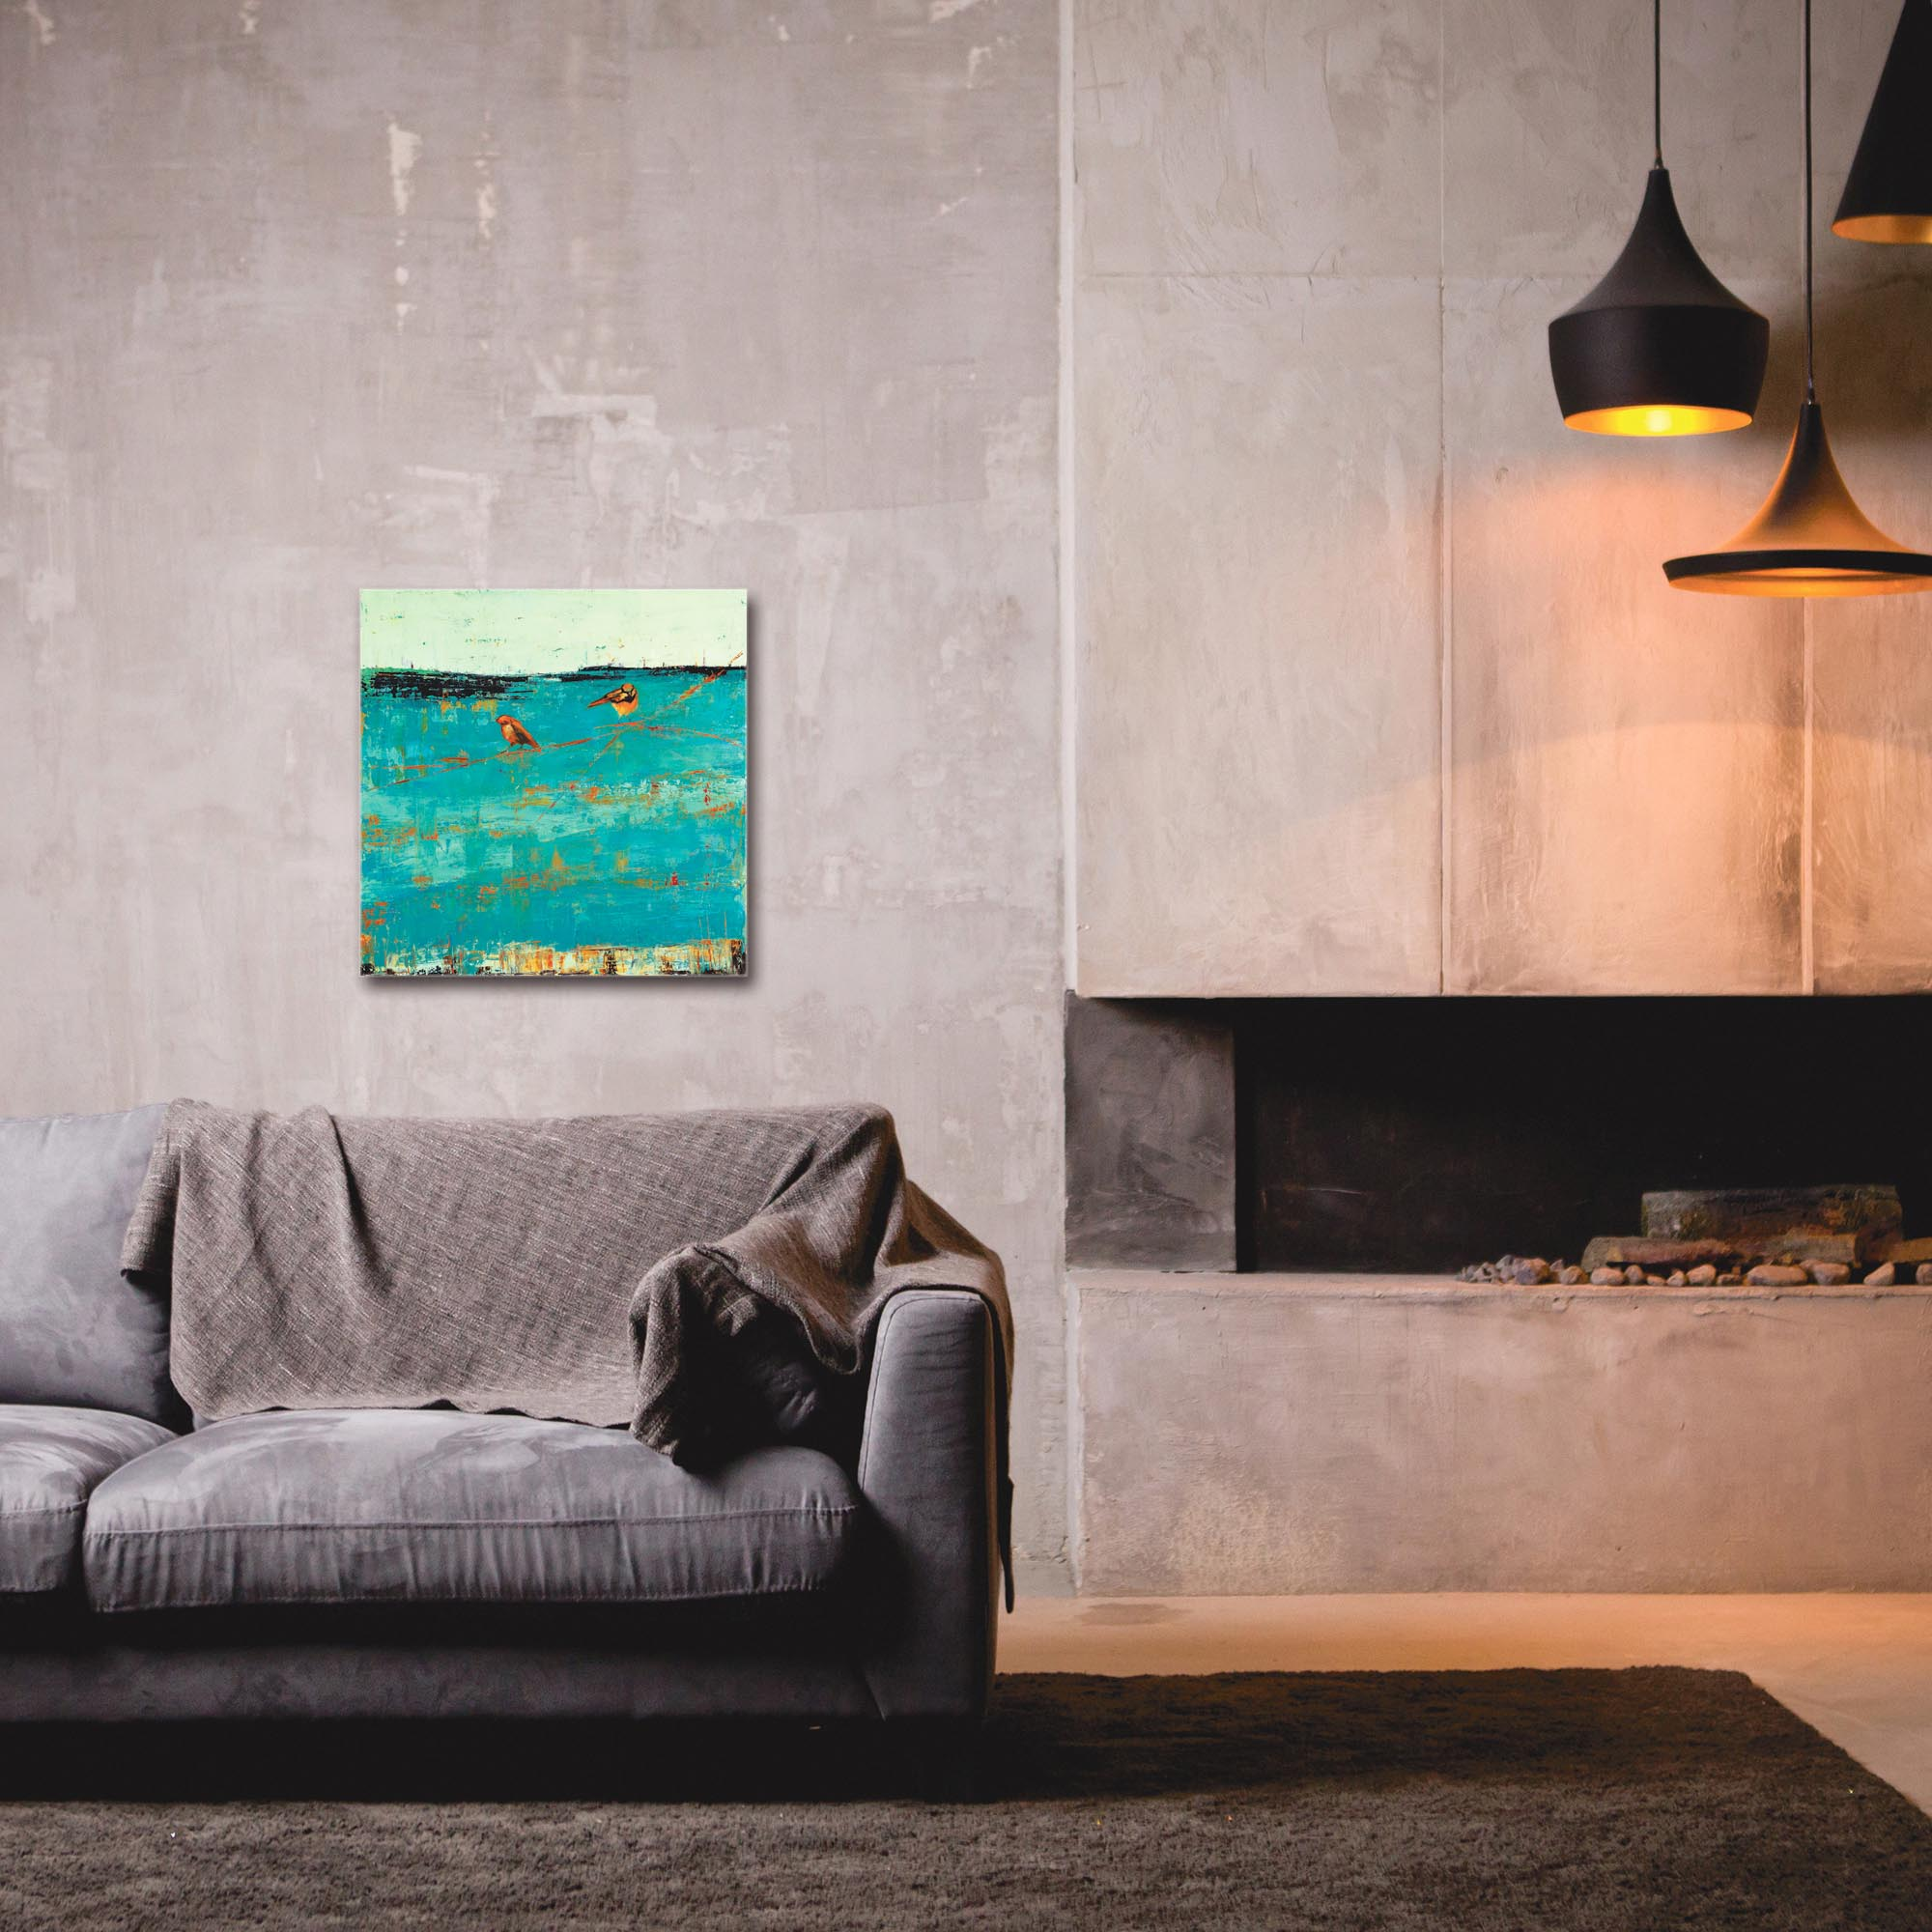 Contemporary Wall Art 'Two Chickadees on a Blue Horizon' - Urban Birds Decor on Metal or Plexiglass - Image 3